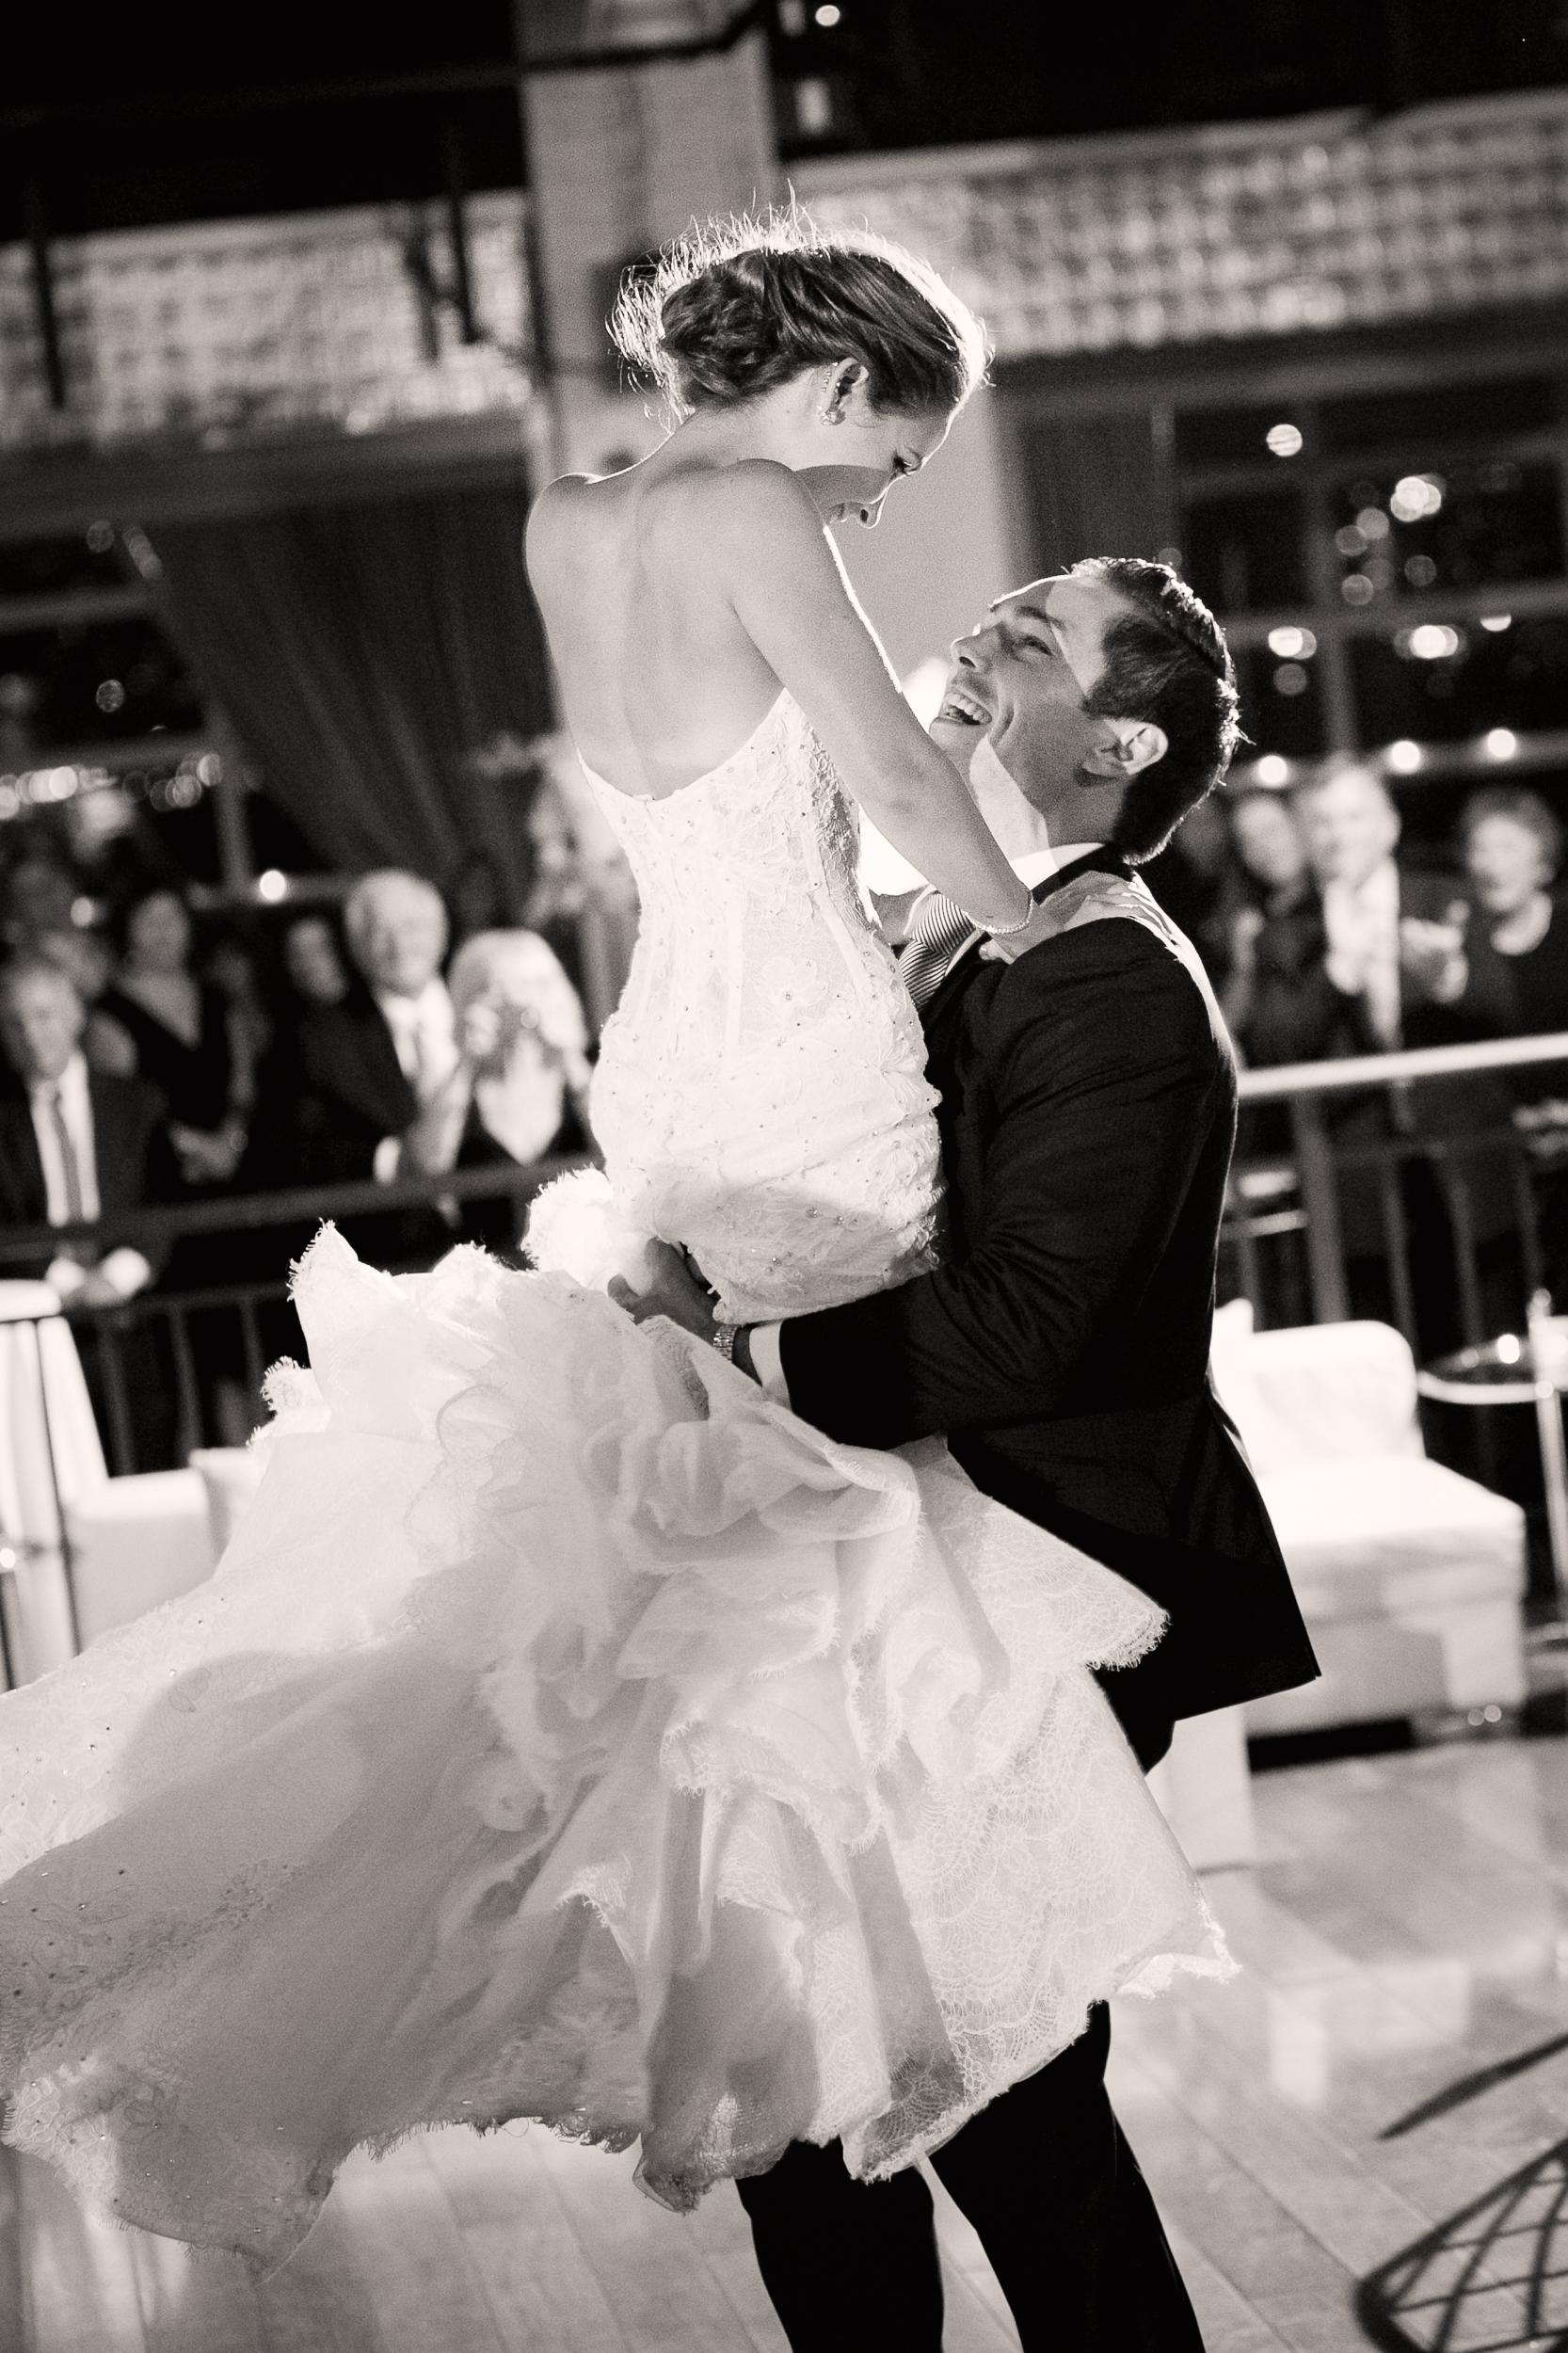 Ceci_New_York_Style_Luxury_Custom_Summer_Wedding_CeciBride_Letterpress_NewYork_Foil_Lighthouse_Chelsea_Piers_72.jpg